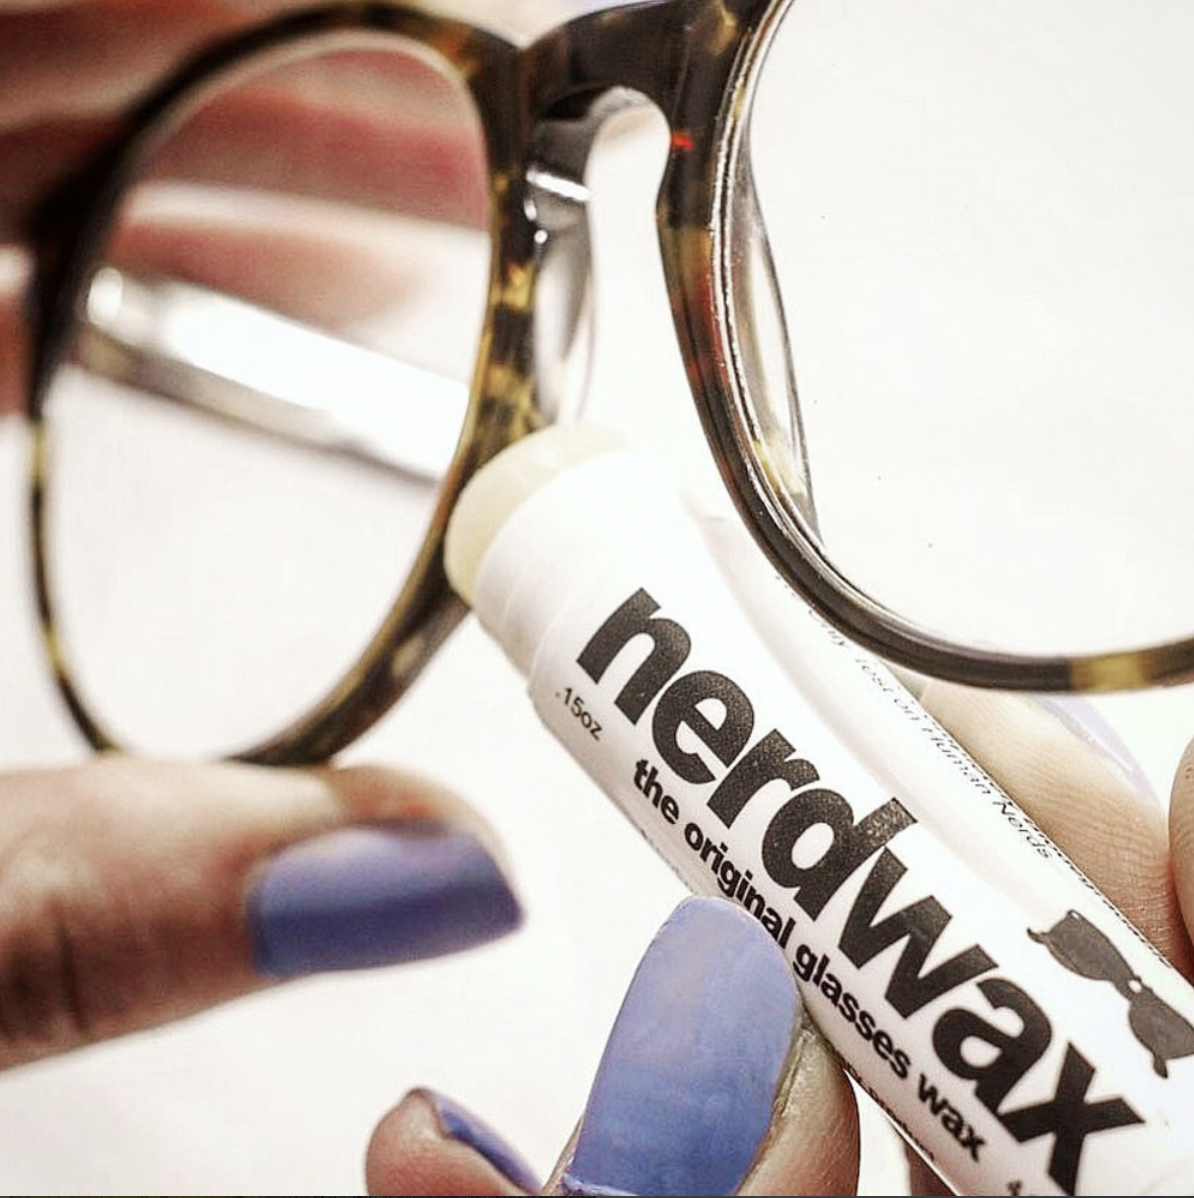 Apparel Accessories Reliable 1 Set Nose Pad Holder Aluminum Eyeglasses Nose Pads Arm Holder For Steel Glasses Frame Plug Sun Glasses Accessories Yet Not Vulgar Men's Glasses